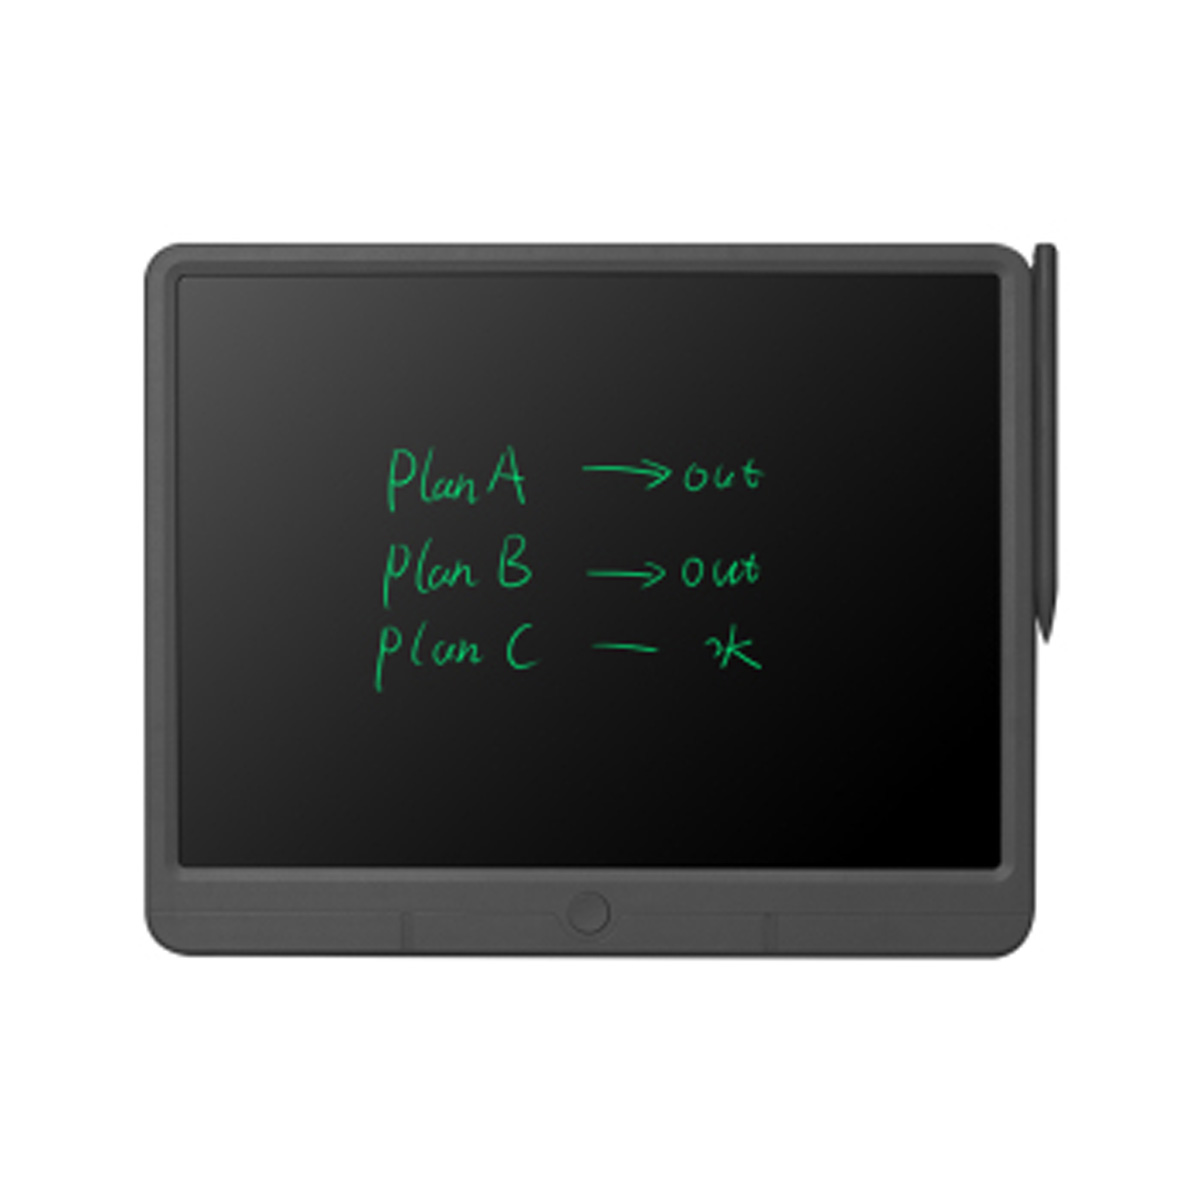 Lousa Eletrônica Mágica Tablet 15 Polegadas Wicue